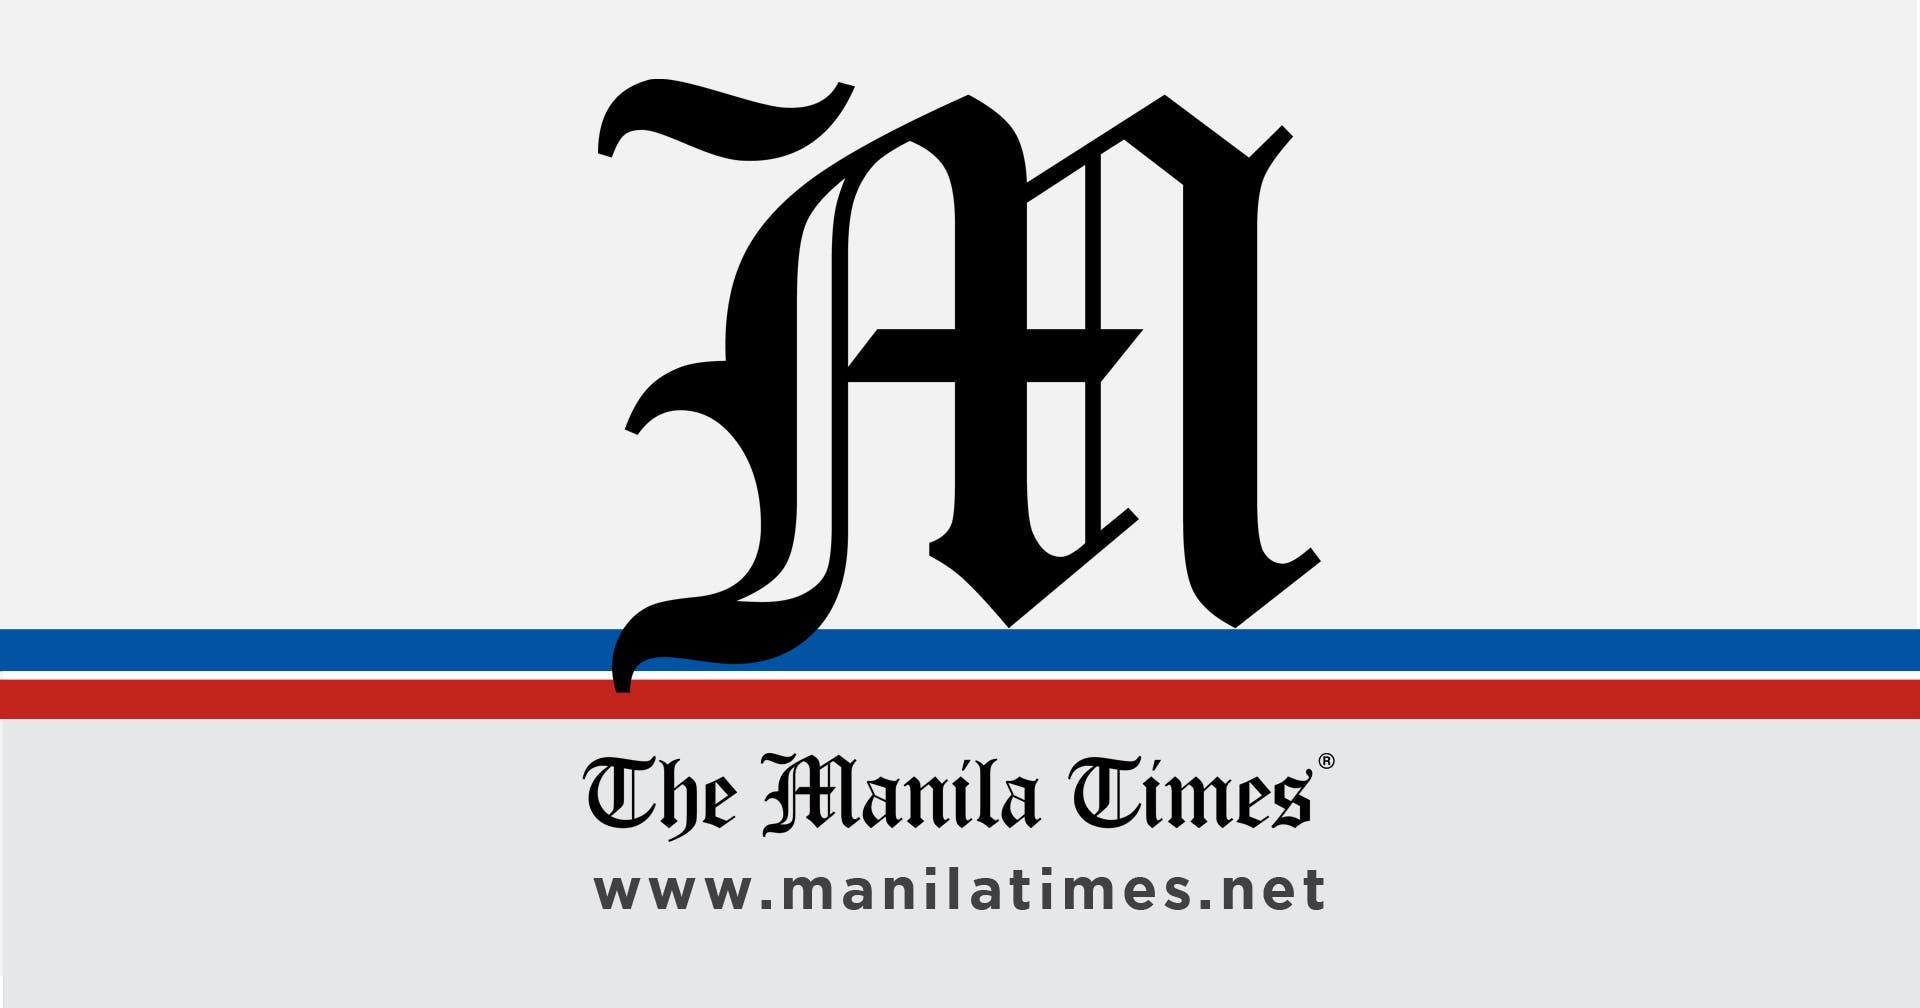 DynaQuest, building new economies on blockchain – The Manila Times